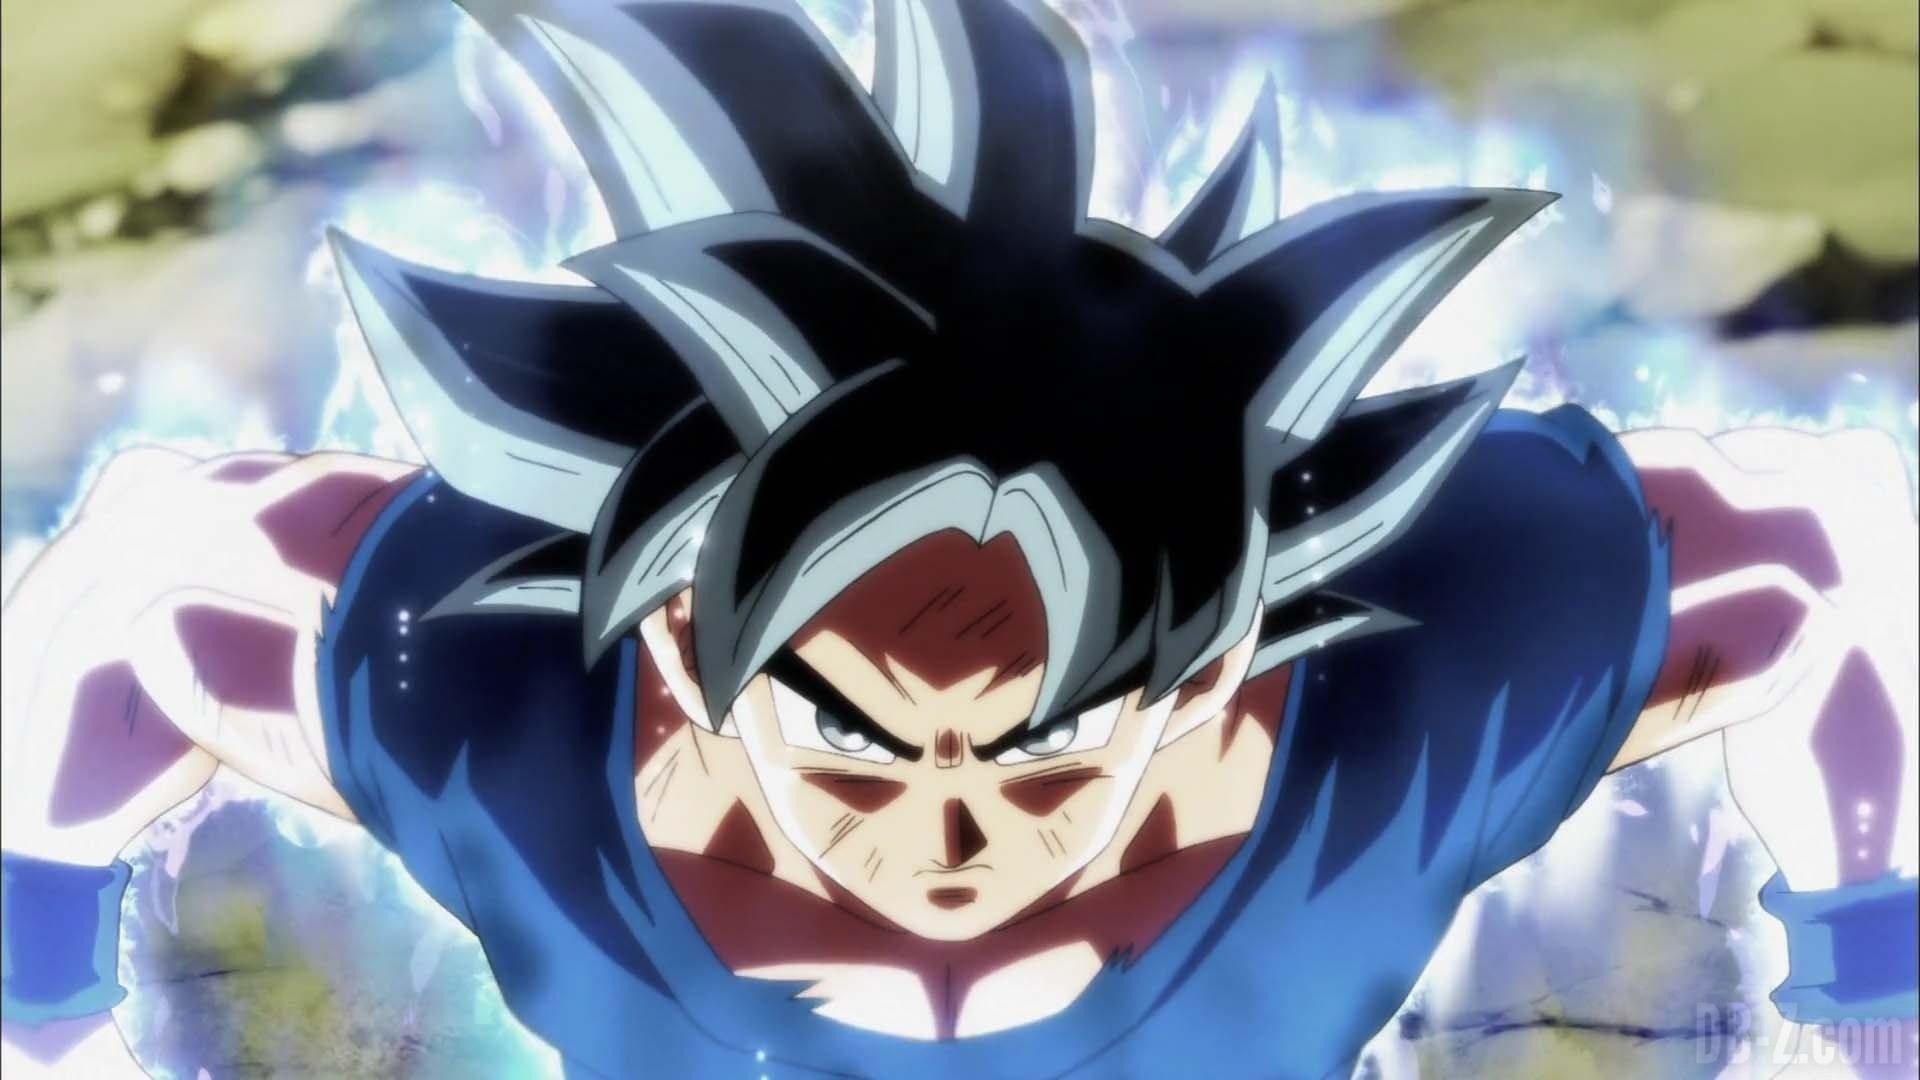 Goku vs broly fan animation - 1 6